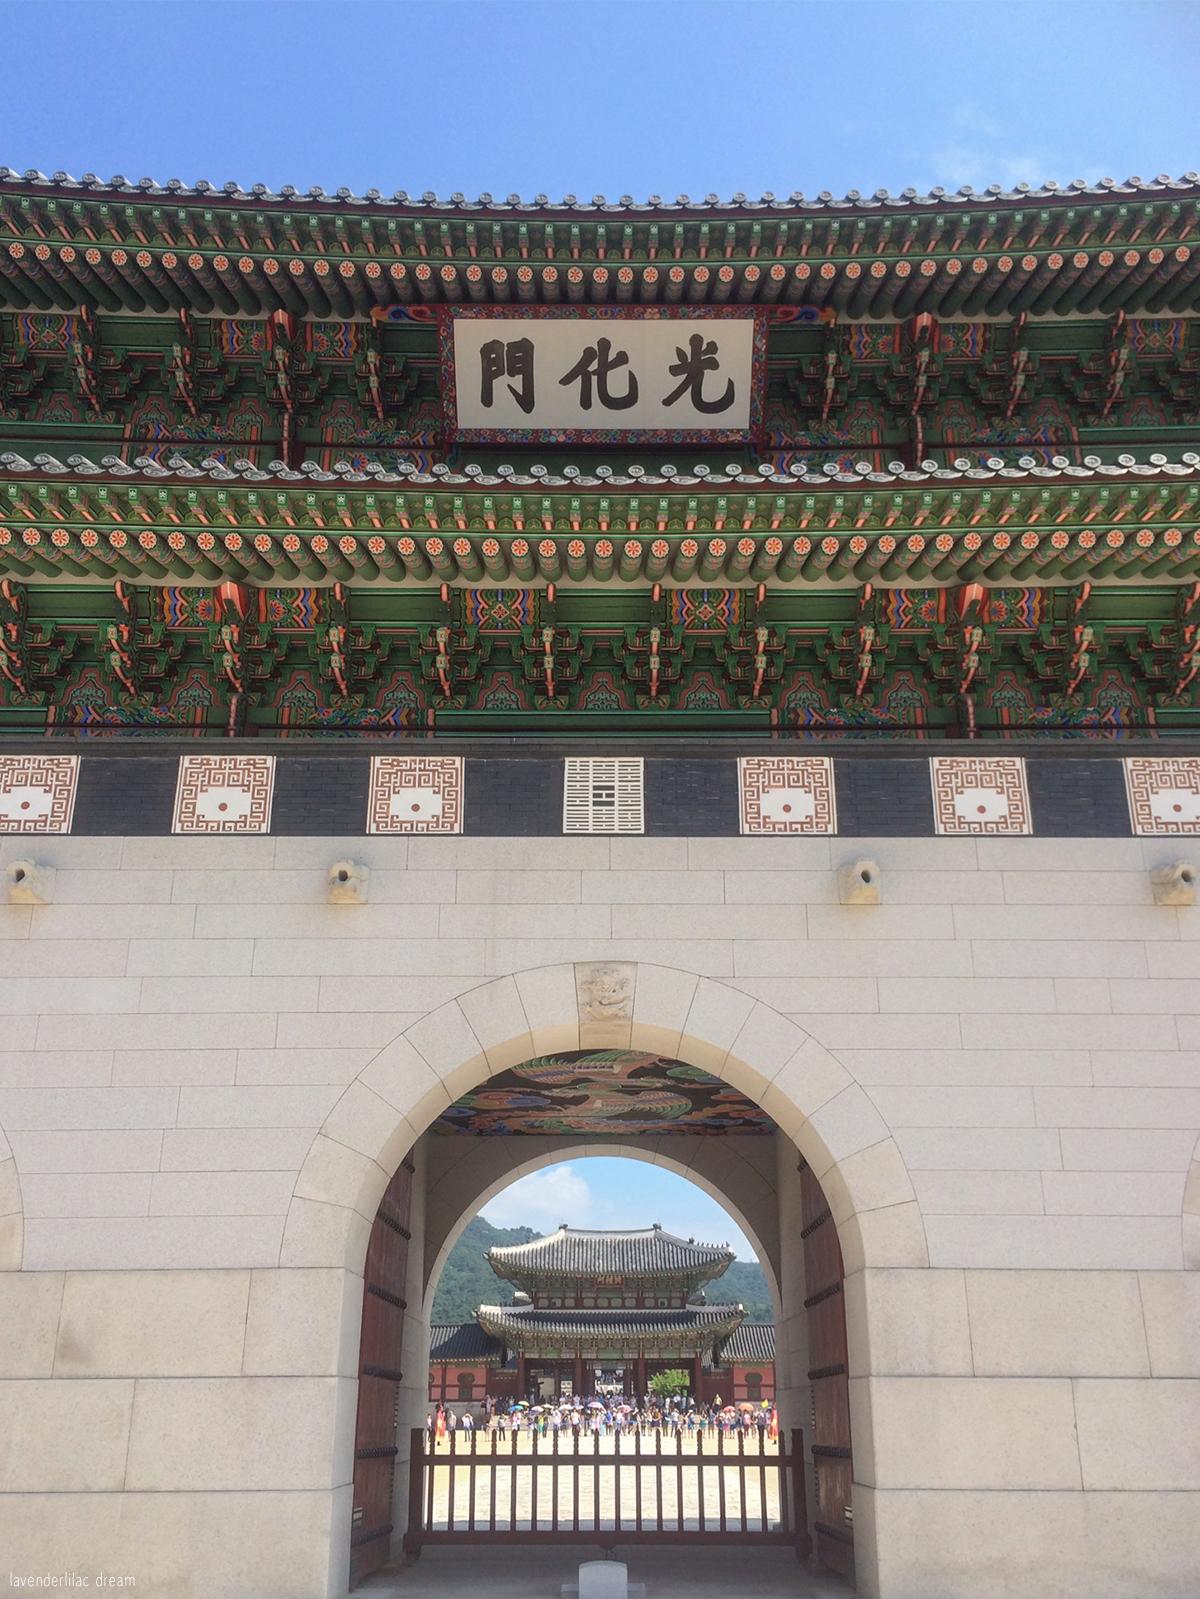 Seoul, Korea - Summer Study Abroad 2014 - Seoul City Touring - Gwanghwamun 광화문 光化門